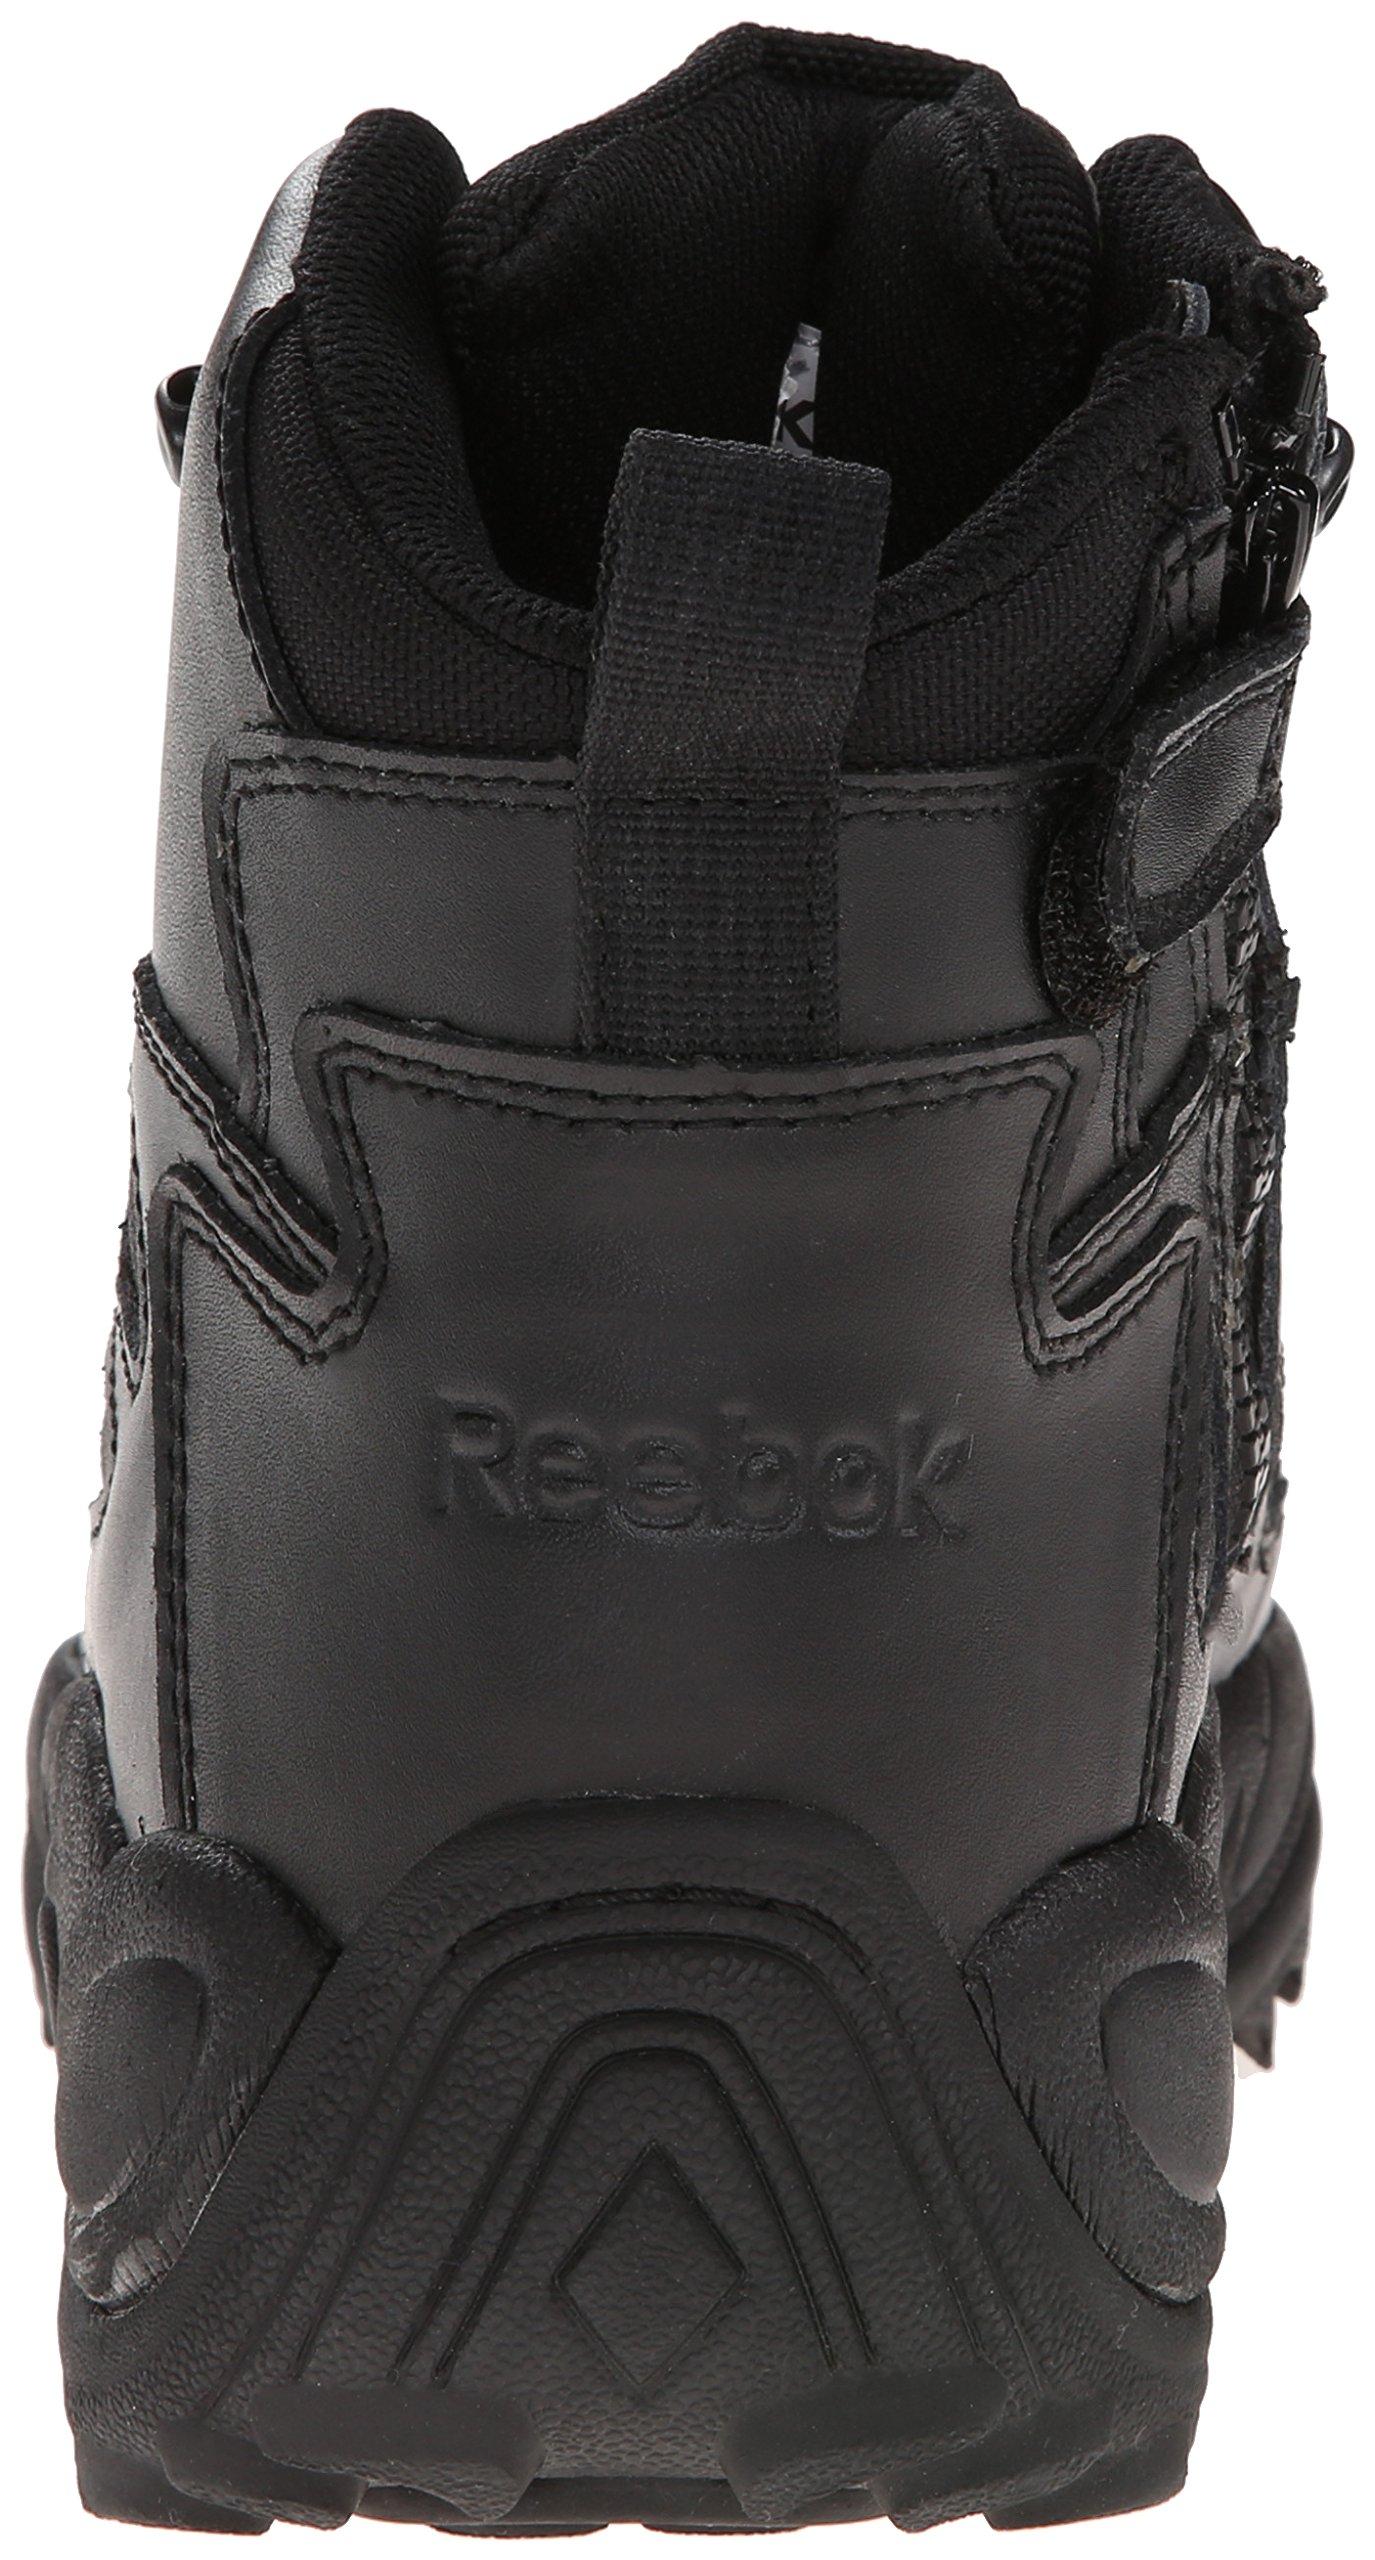 85b4f24062f Reebok Work Duty Men's Rapid Response RB RB8674 6